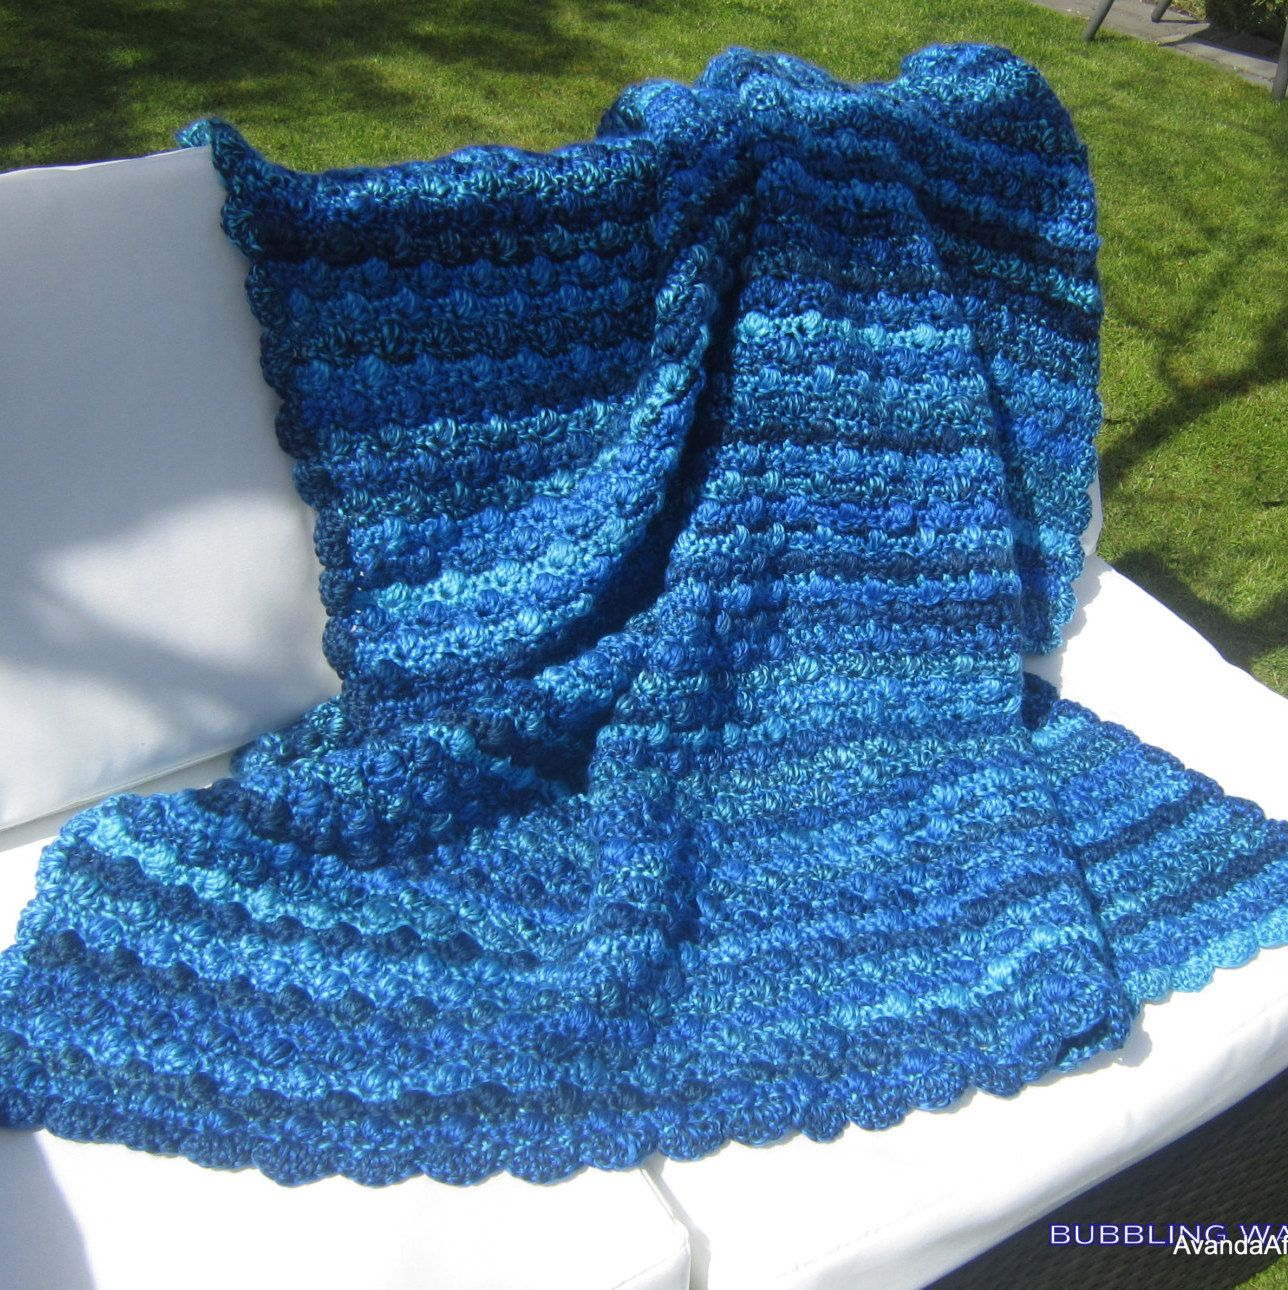 Afghan throw or baby blanket bubbling water crocheted